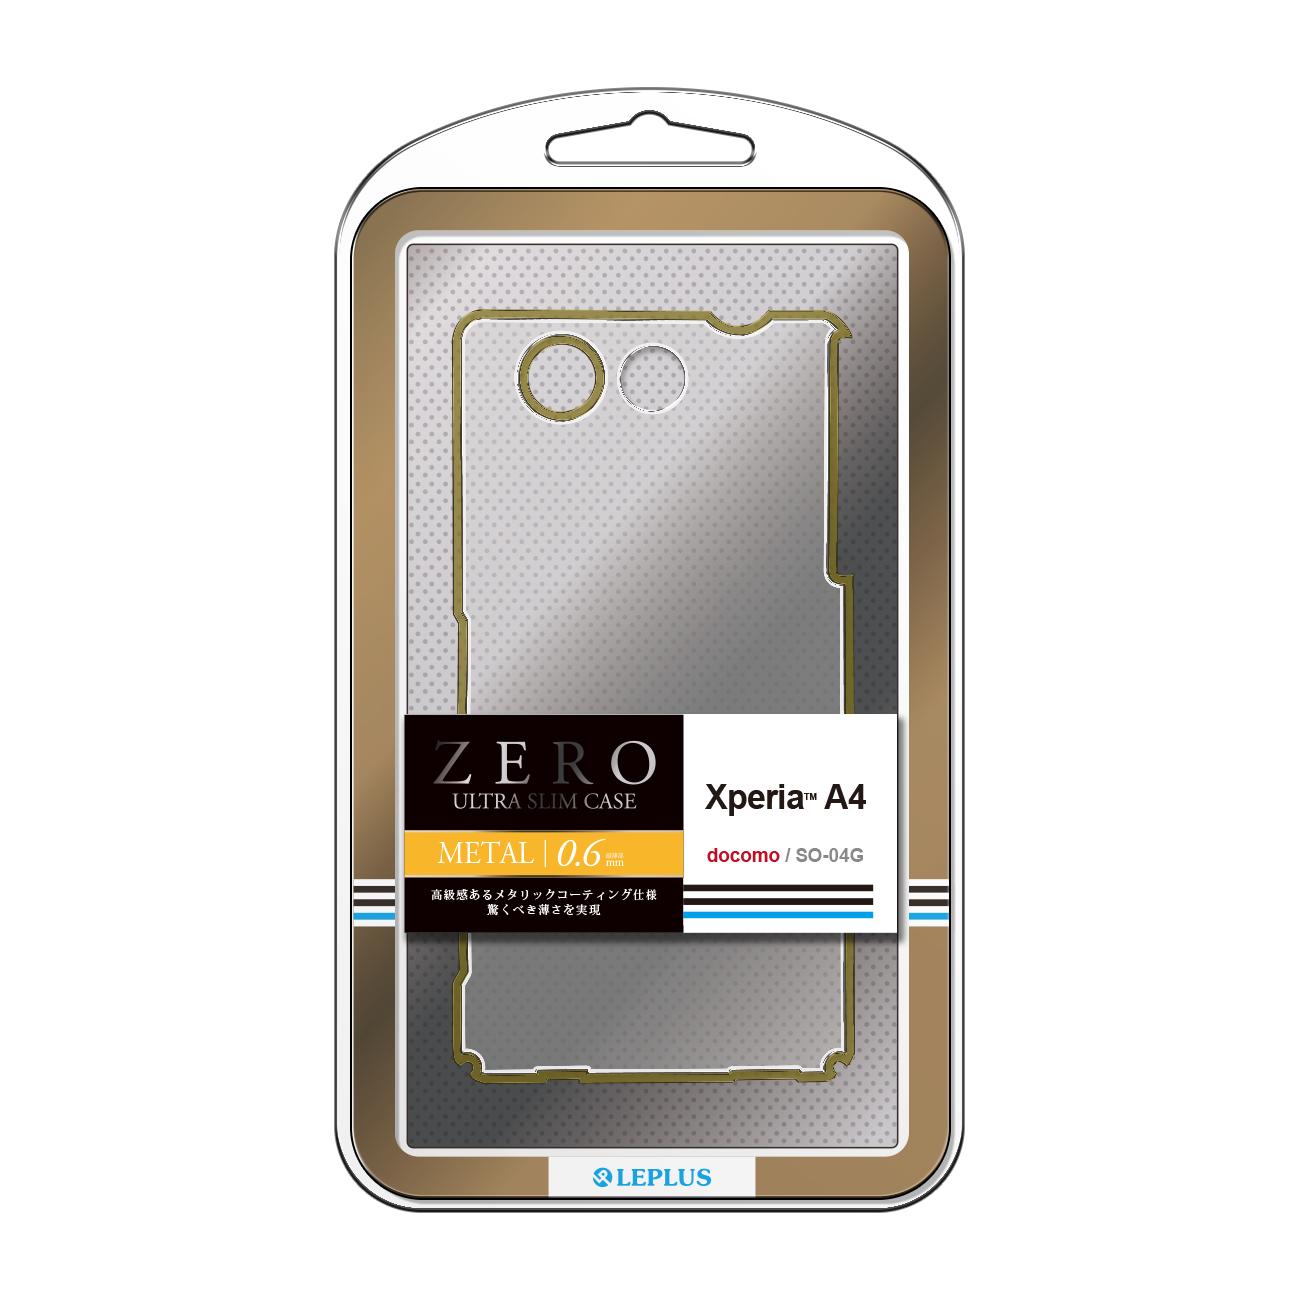 Xperia(TM) A4 SO-04G 超極薄ハードケース「ZERO METAL」 クリア&ゴールド